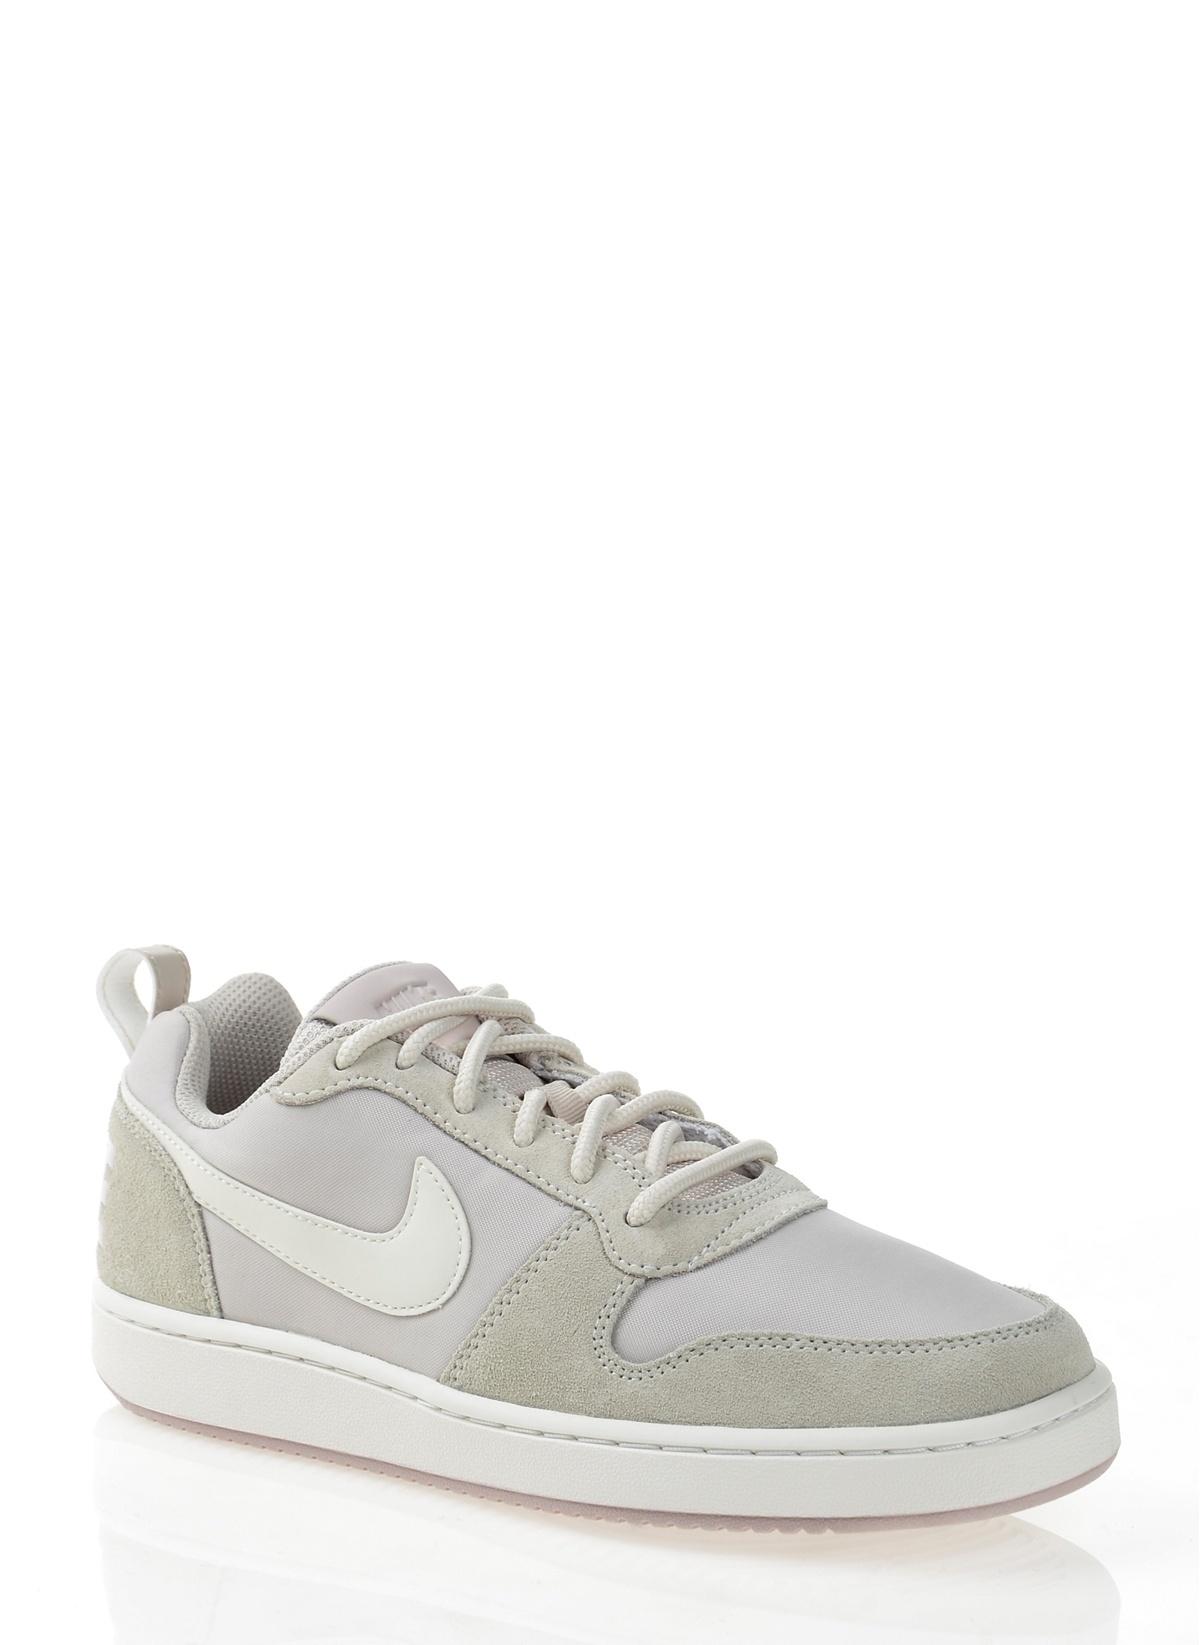 Nike Kadın W Nike Court Borough Low Prem Lt Orewood Brn Sail-Silt ... 9e0cd1c6df3f0